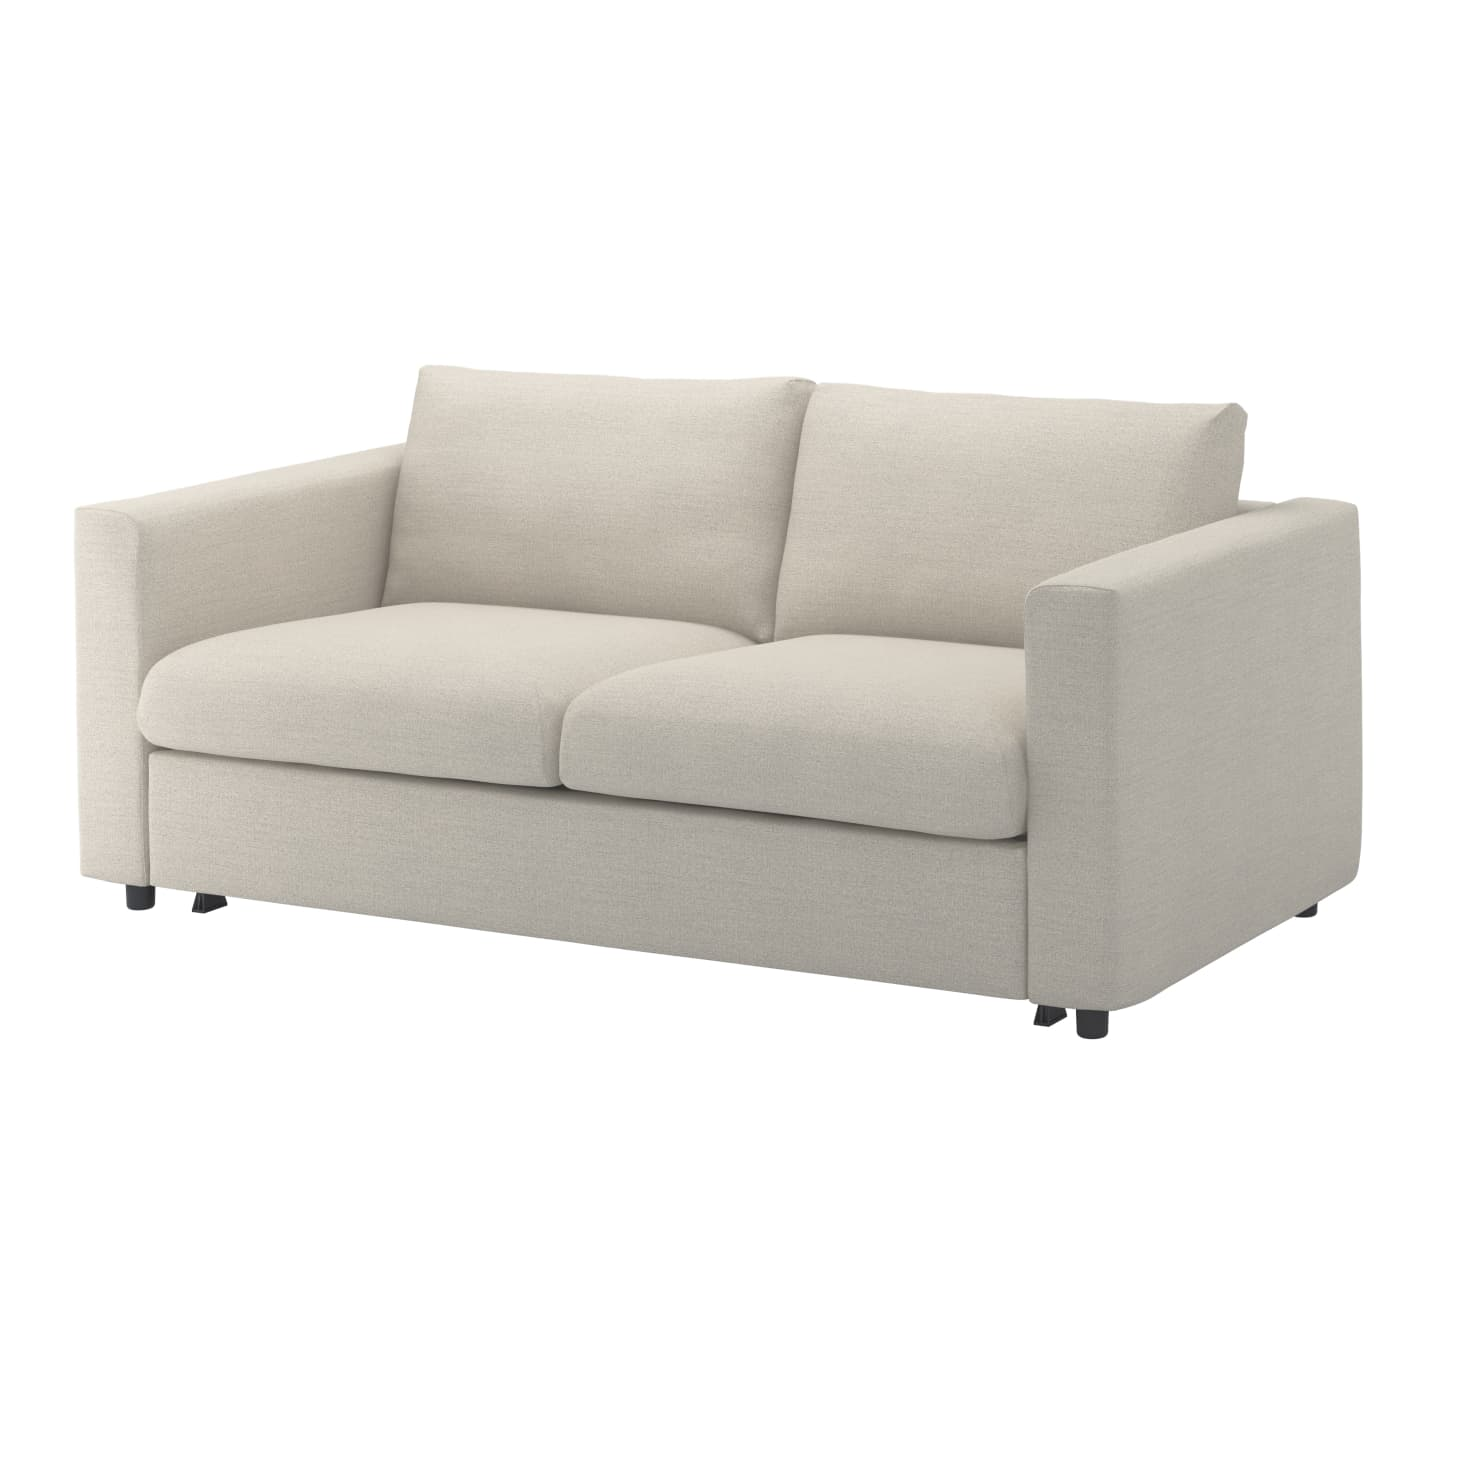 Admirable Ikea Black Friday Sales Deals 2019 Does Ikea Have Black Machost Co Dining Chair Design Ideas Machostcouk